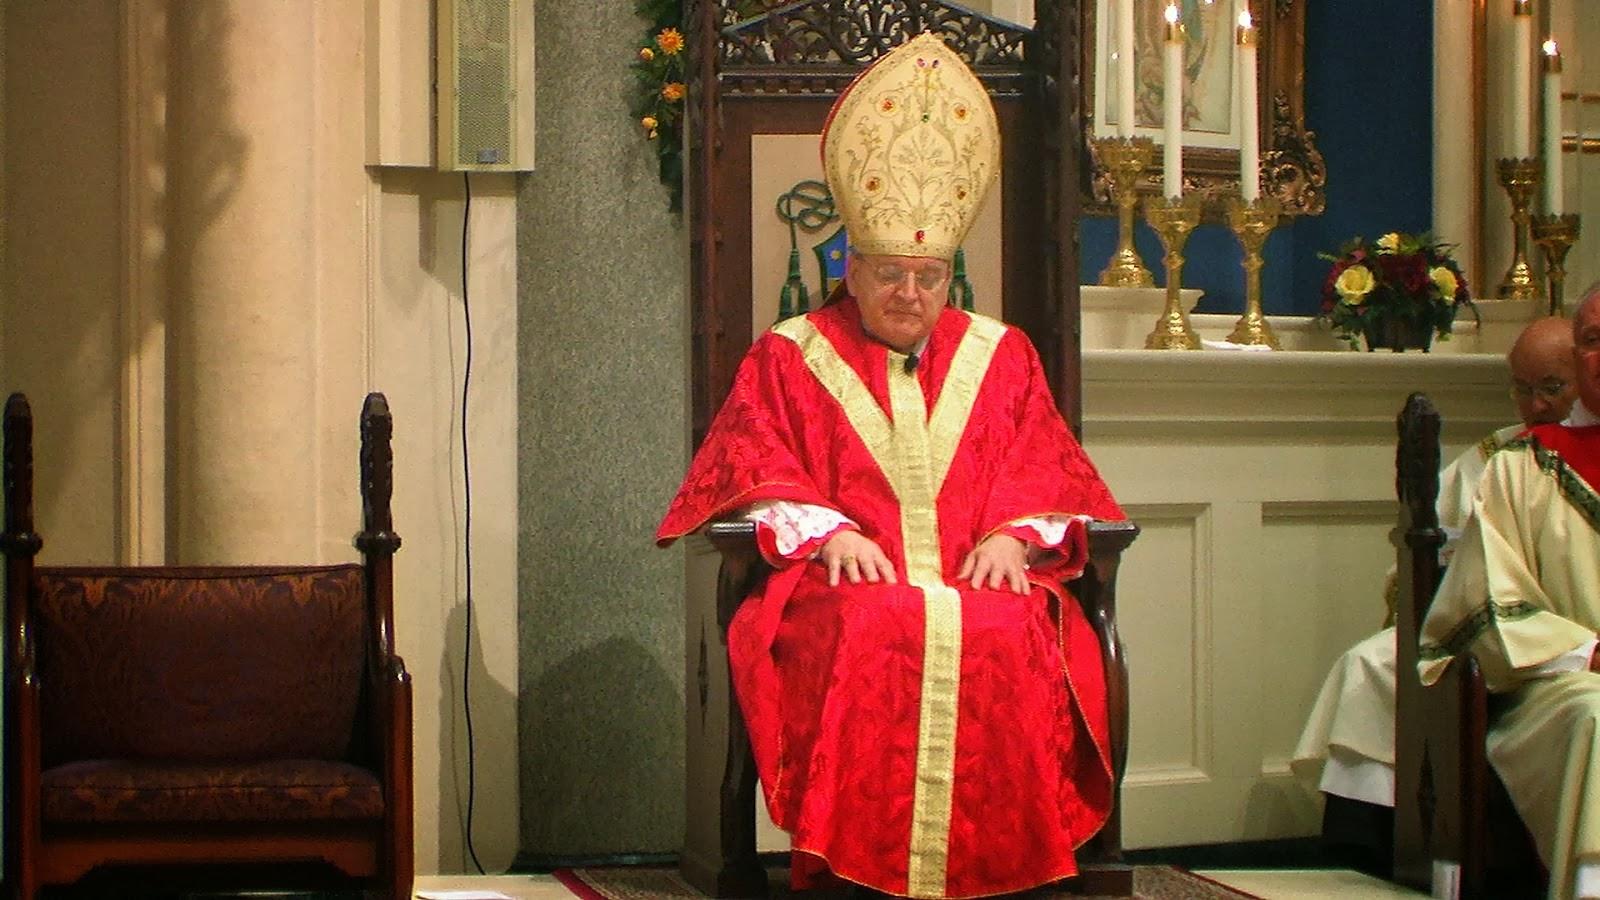 Catholic diocese of peoria il